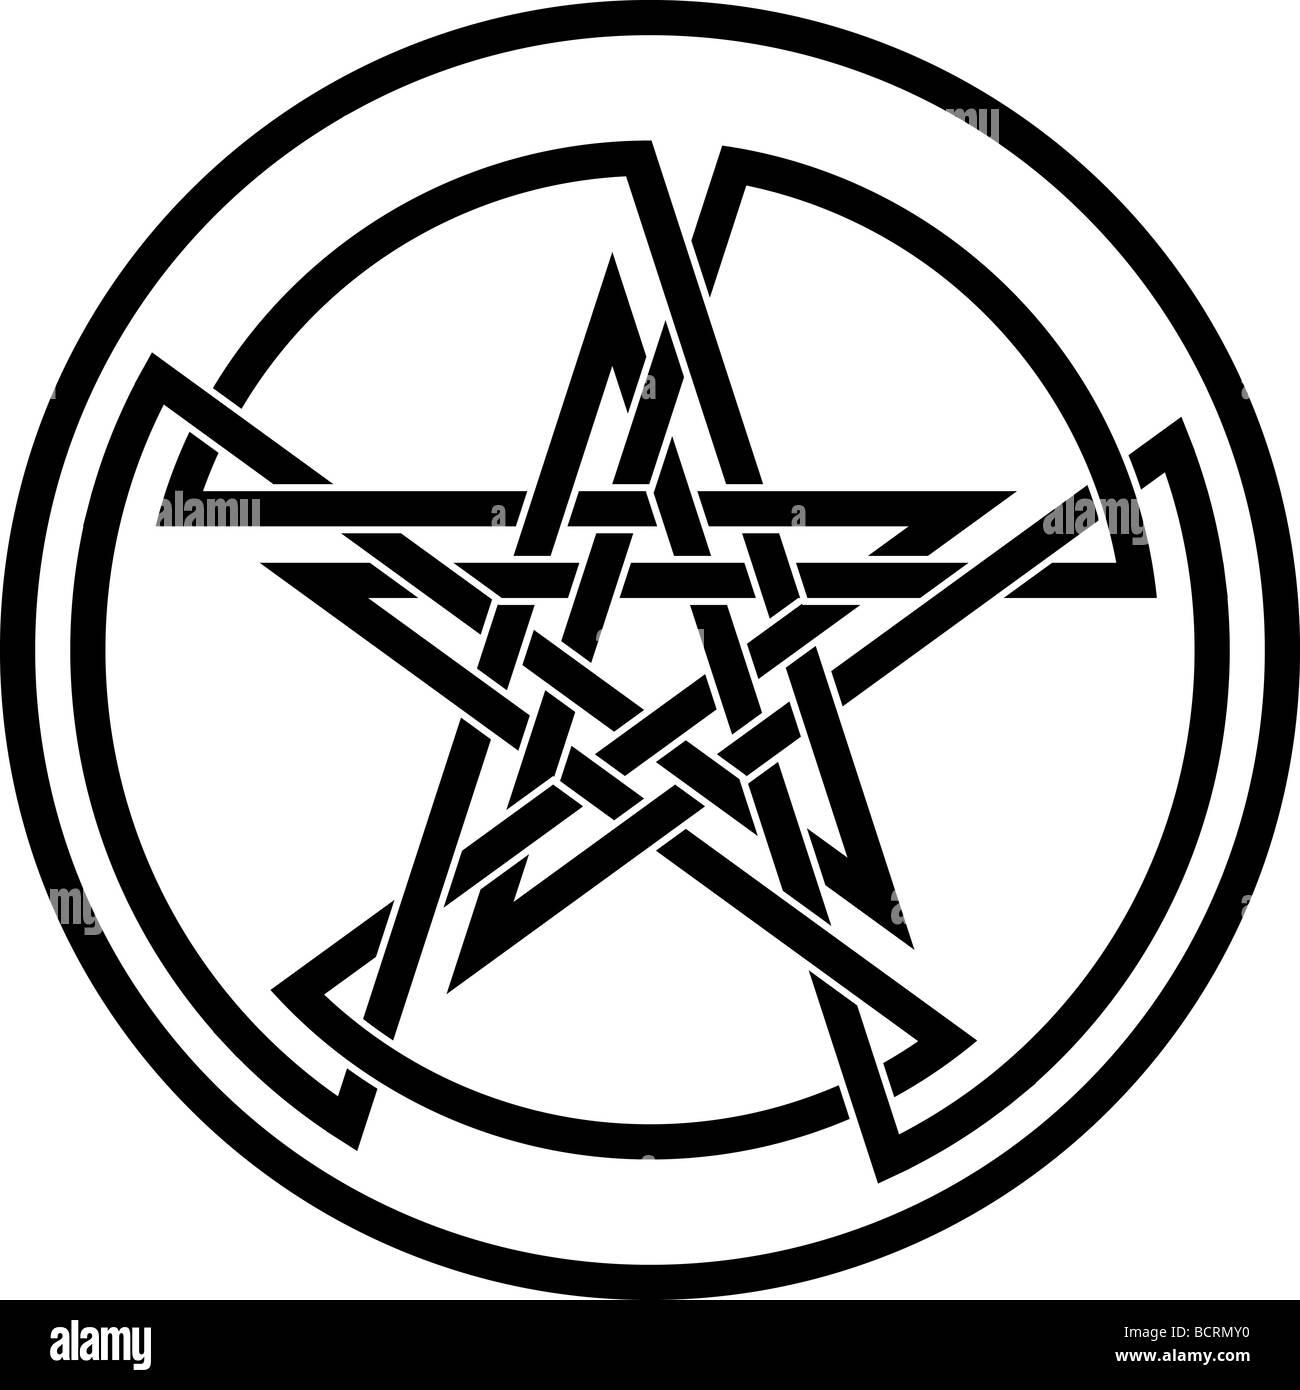 Double Pentagram Tattoo T Shirt Design Stock Photo 25107572 Alamy